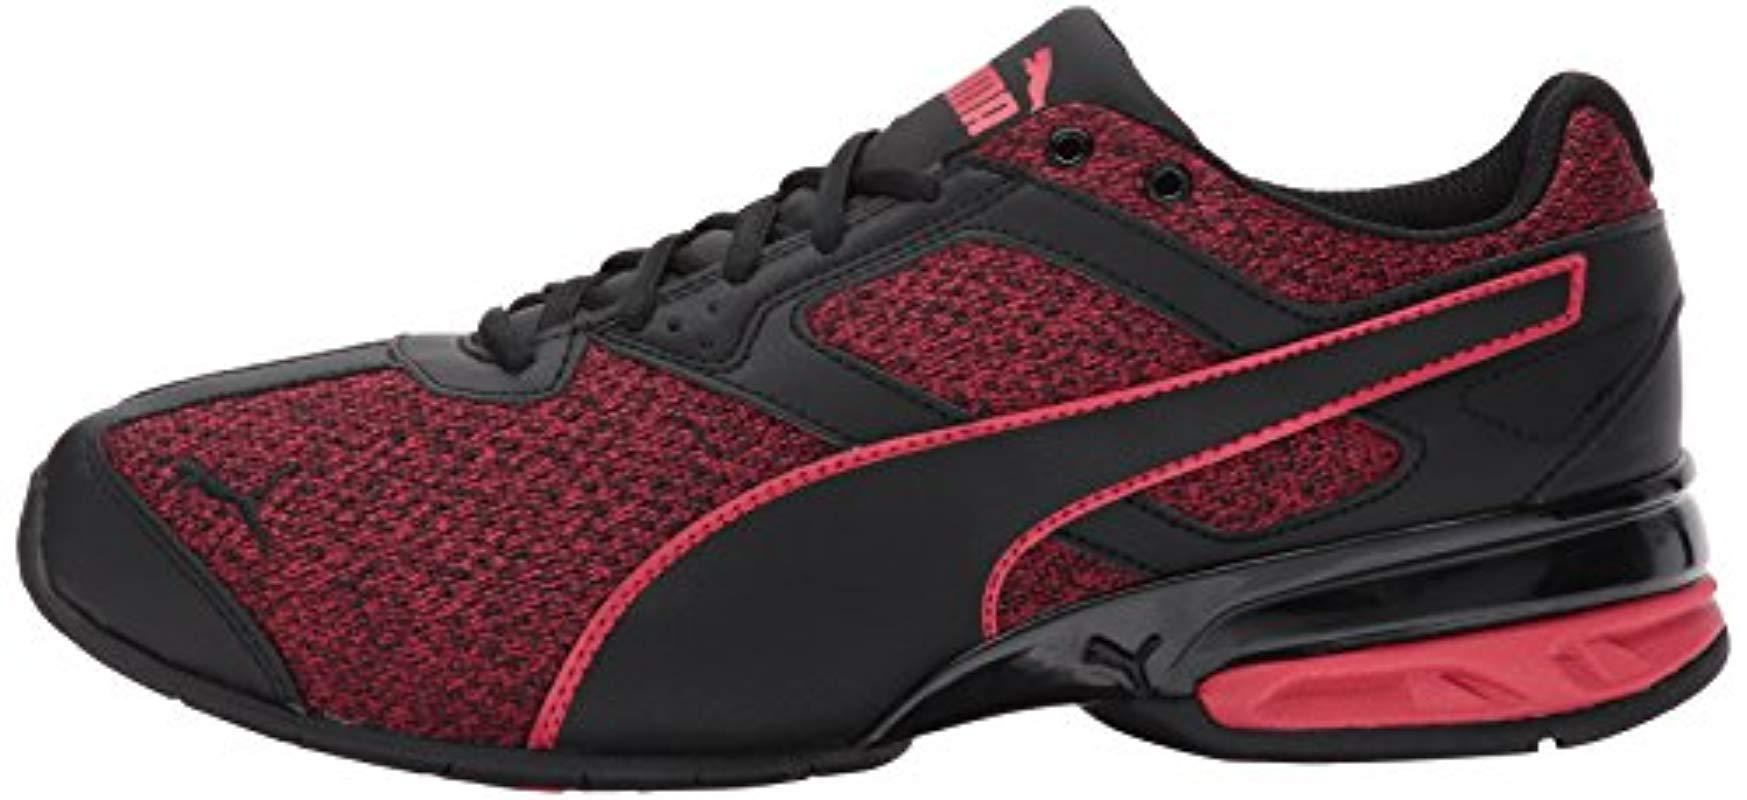 PUMA Rubber Tazon 6 Knit Men's Sneakers